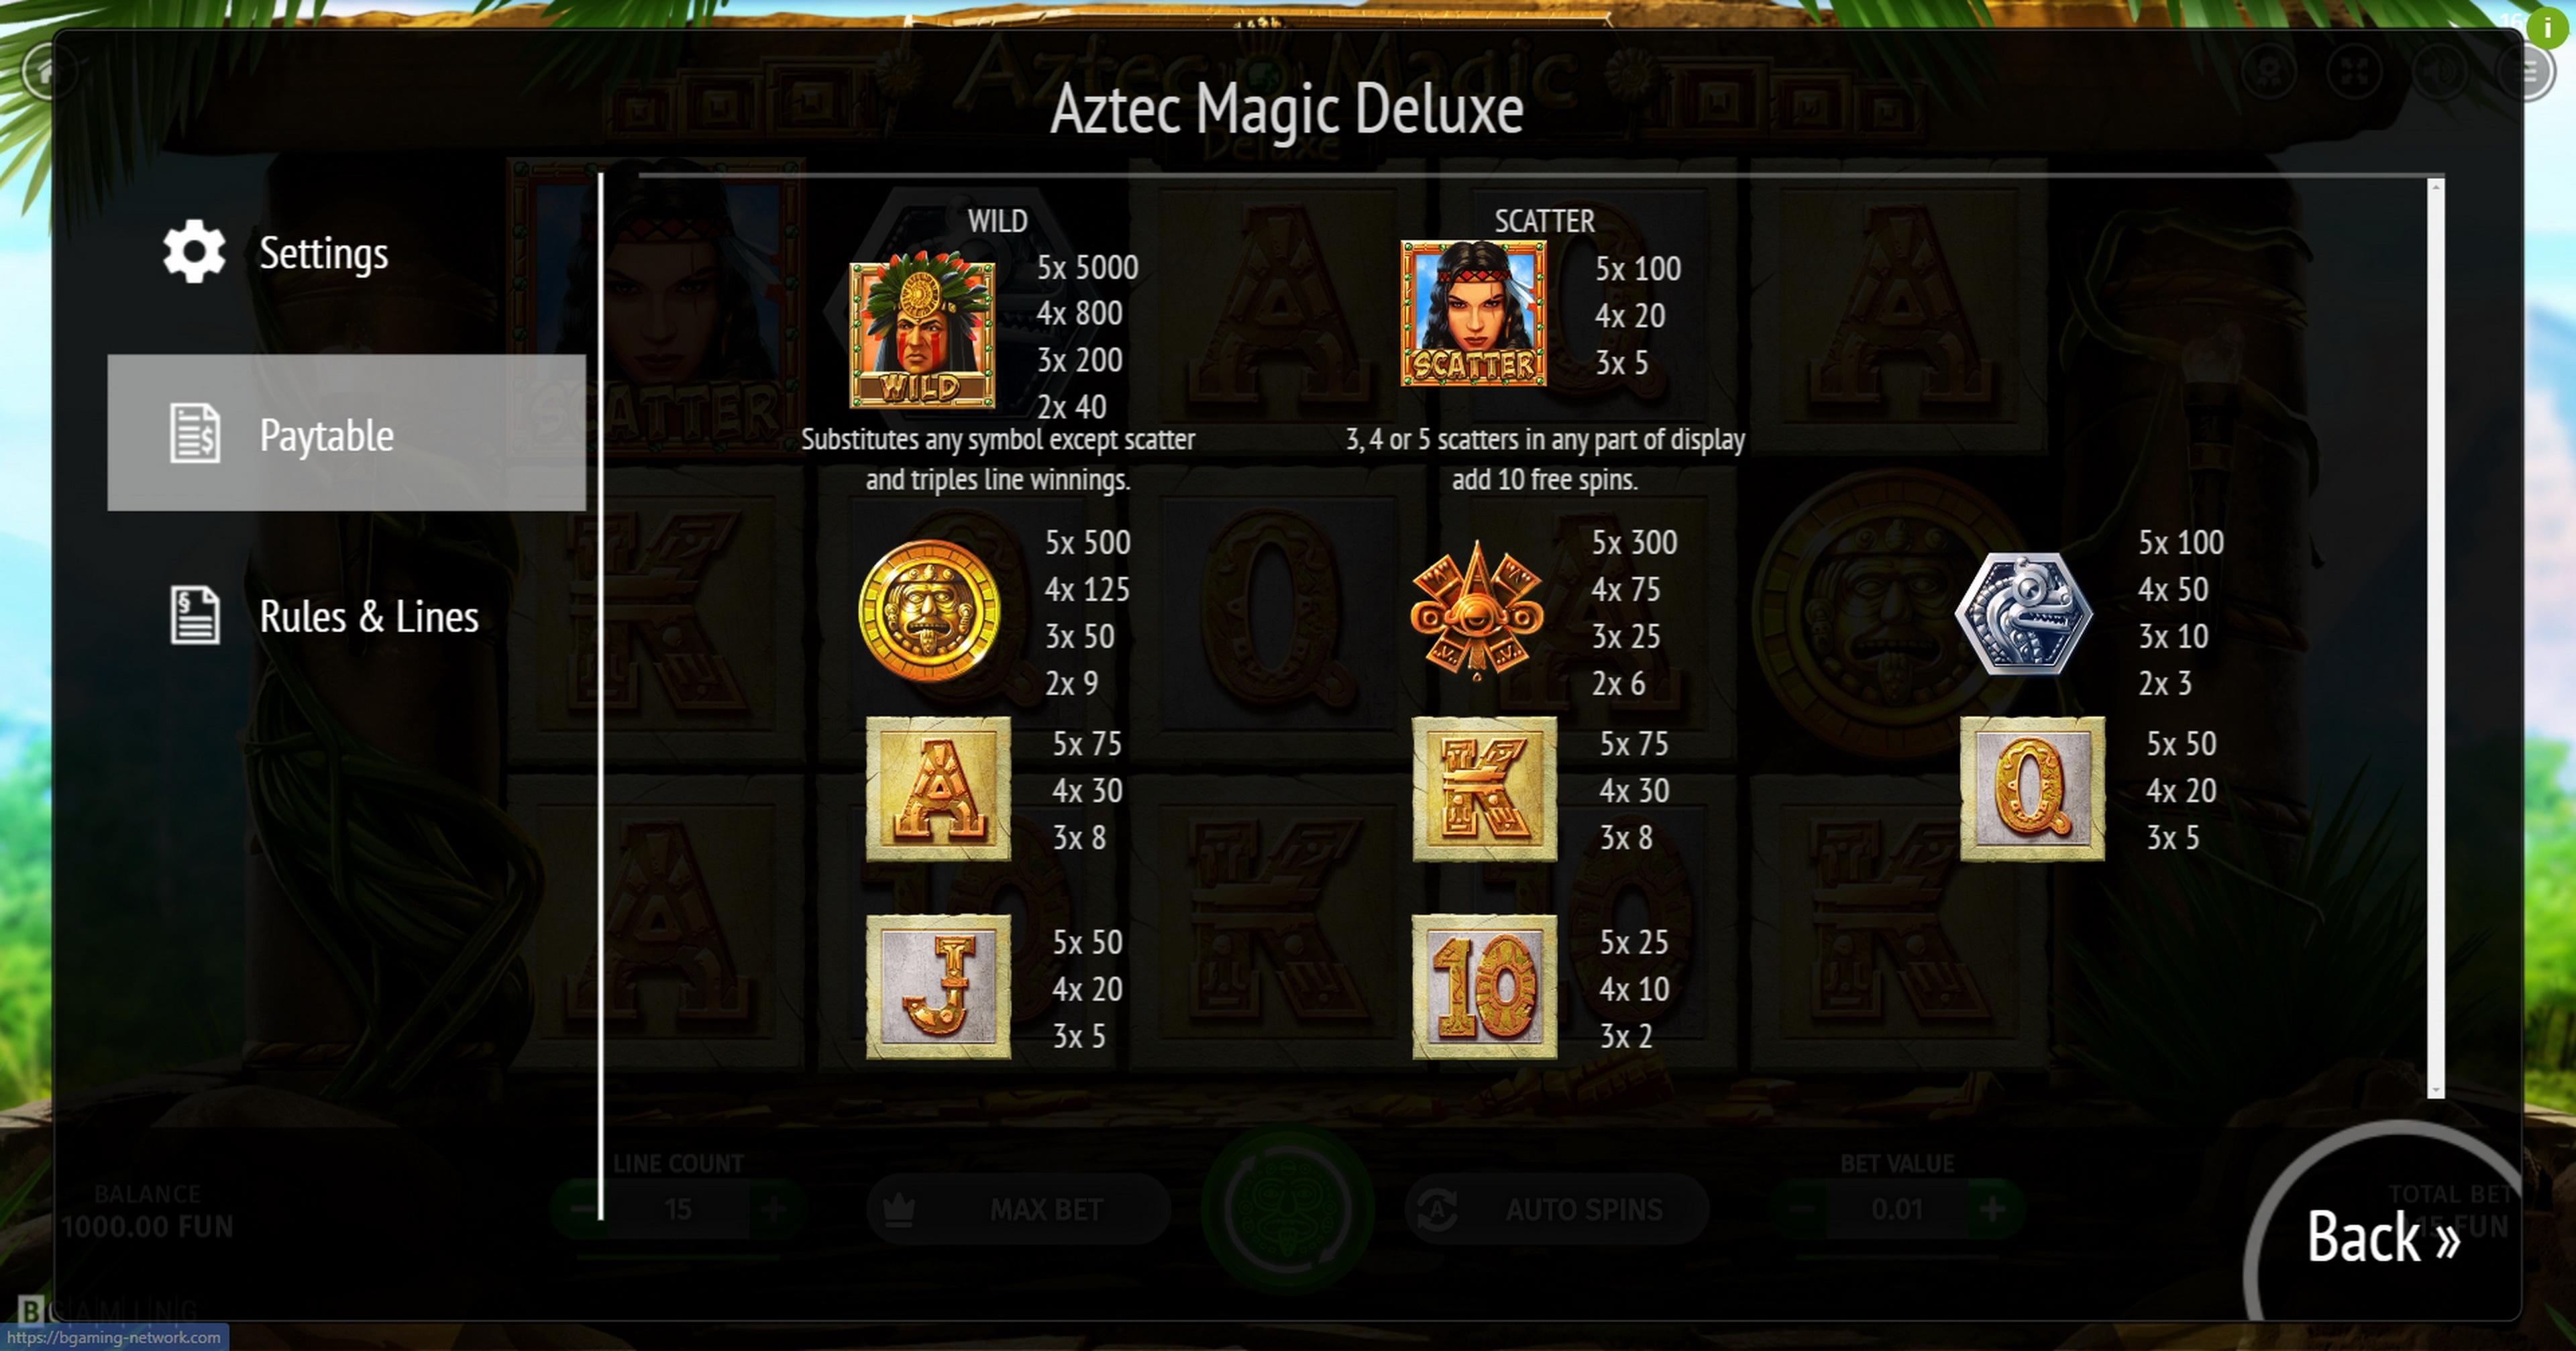 Aztec Magic Deluxe Slot Machine